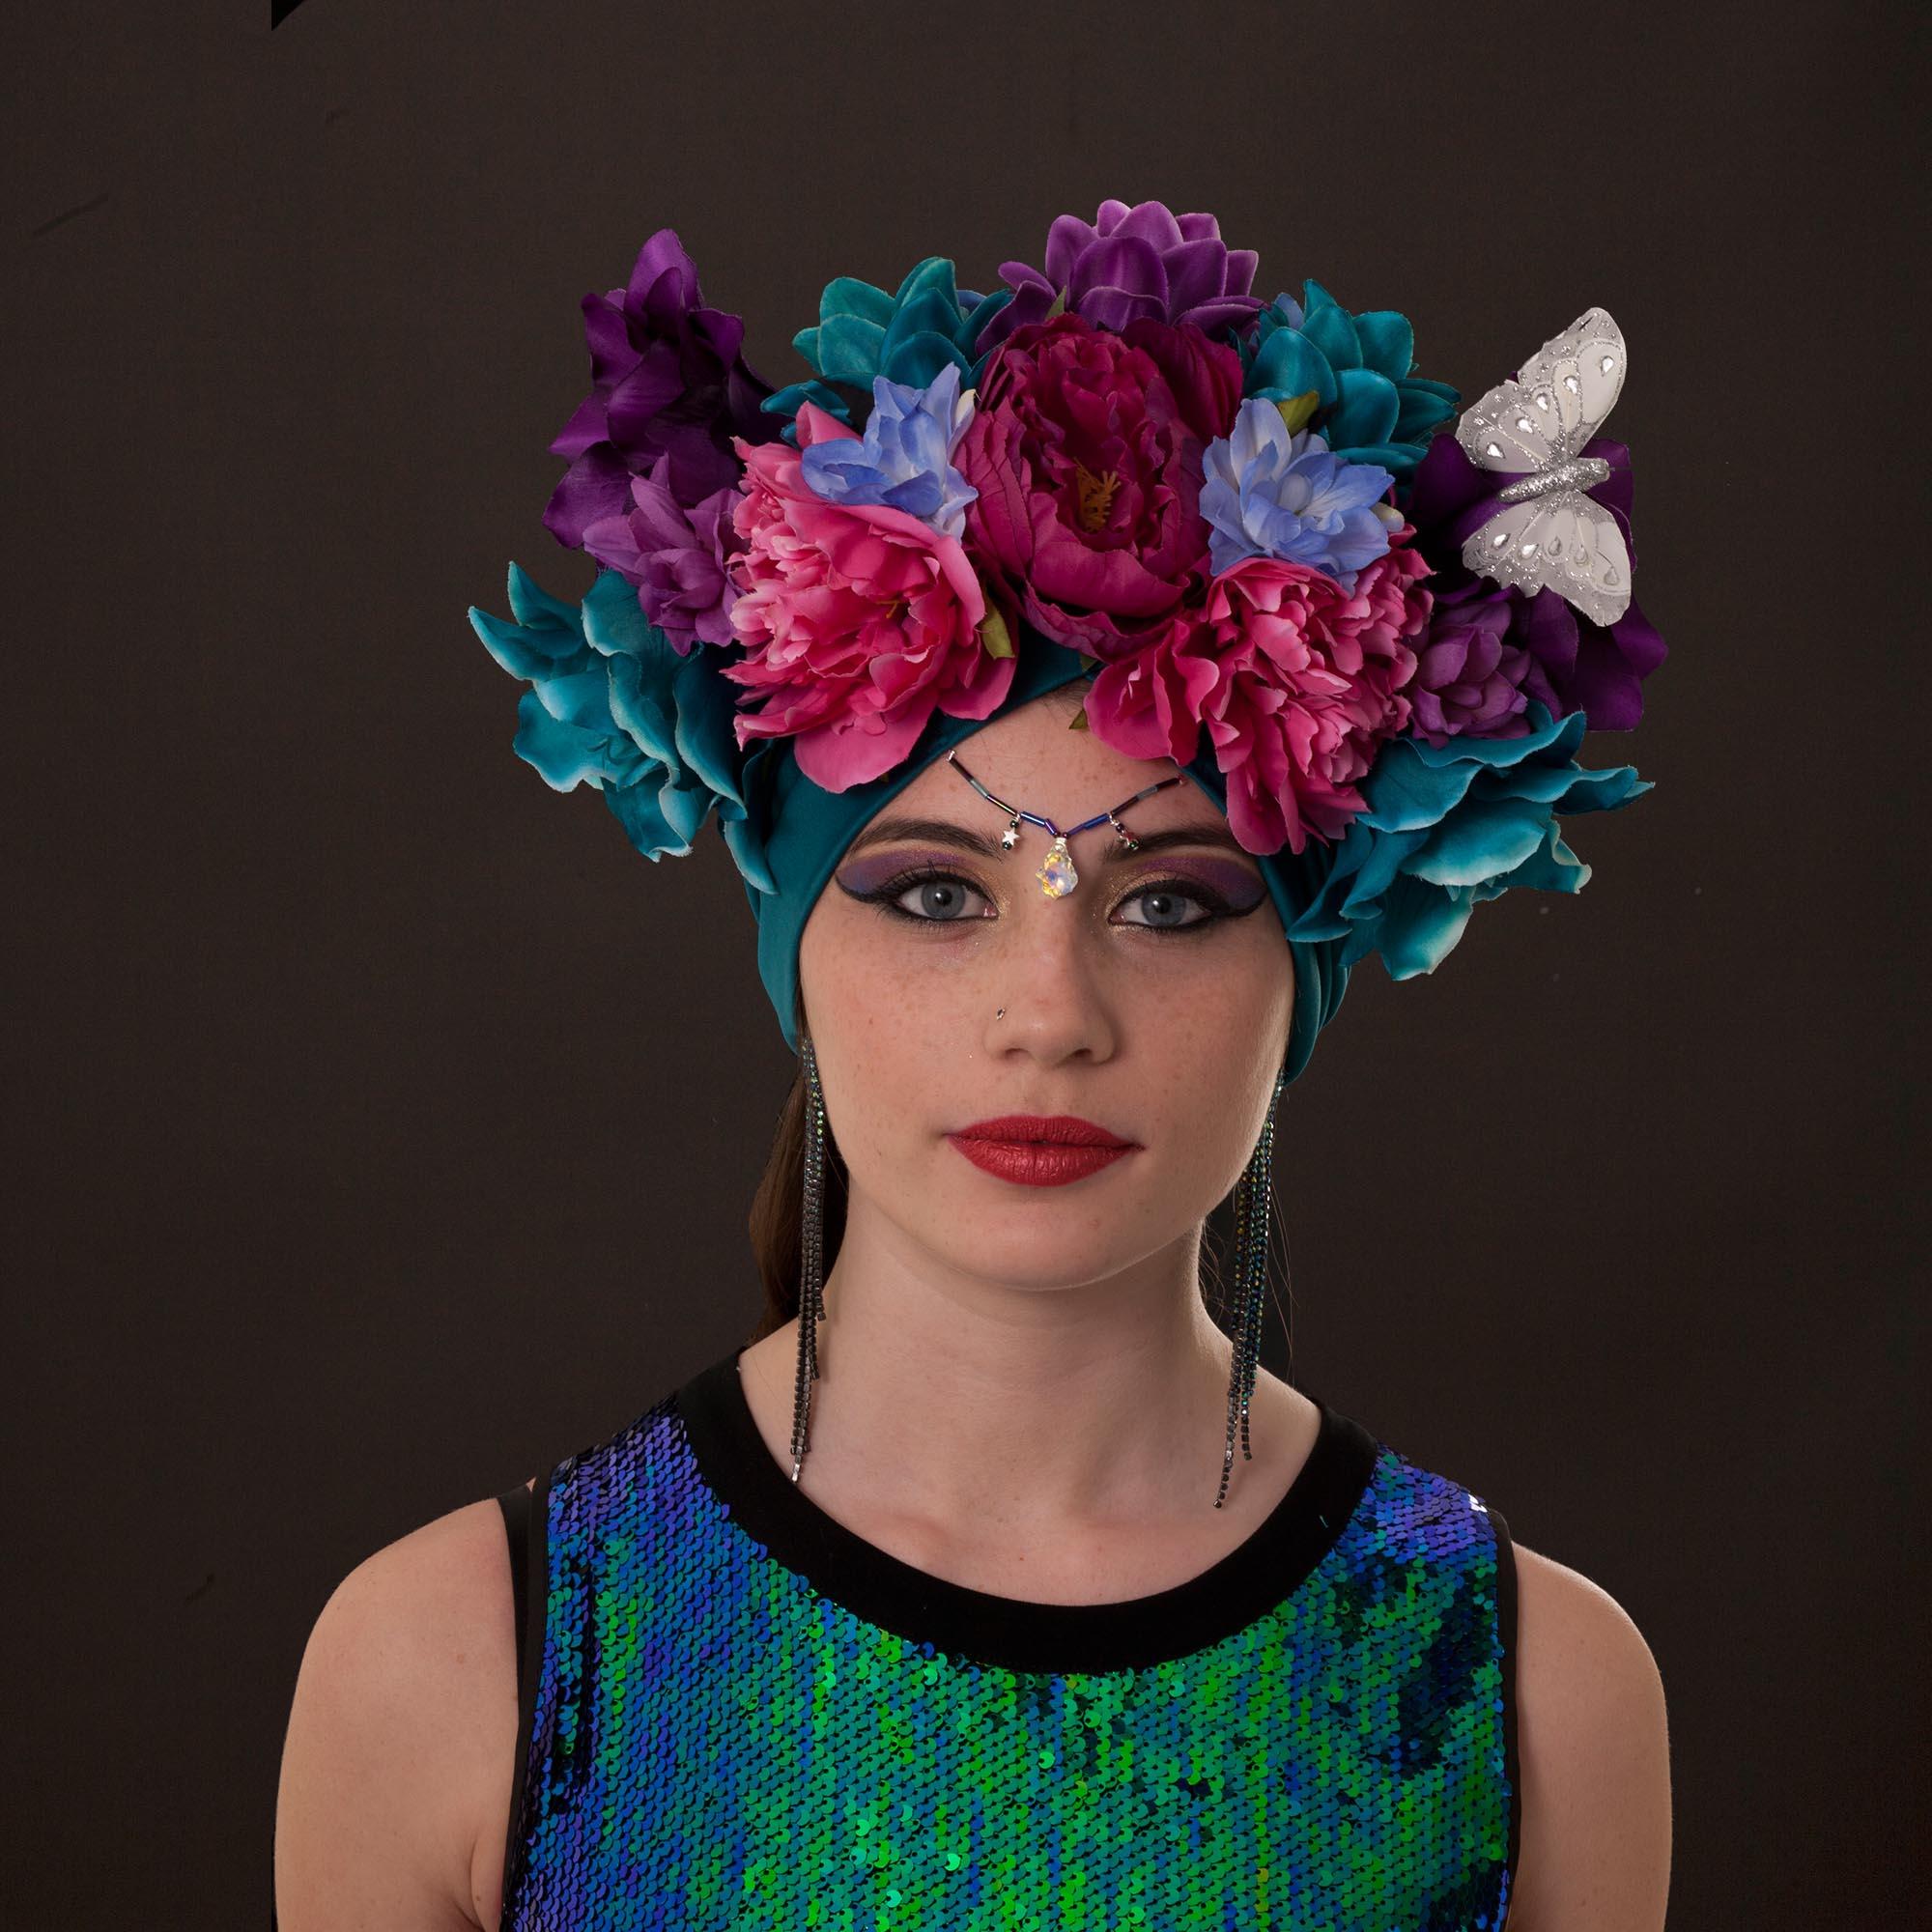 Win this turban